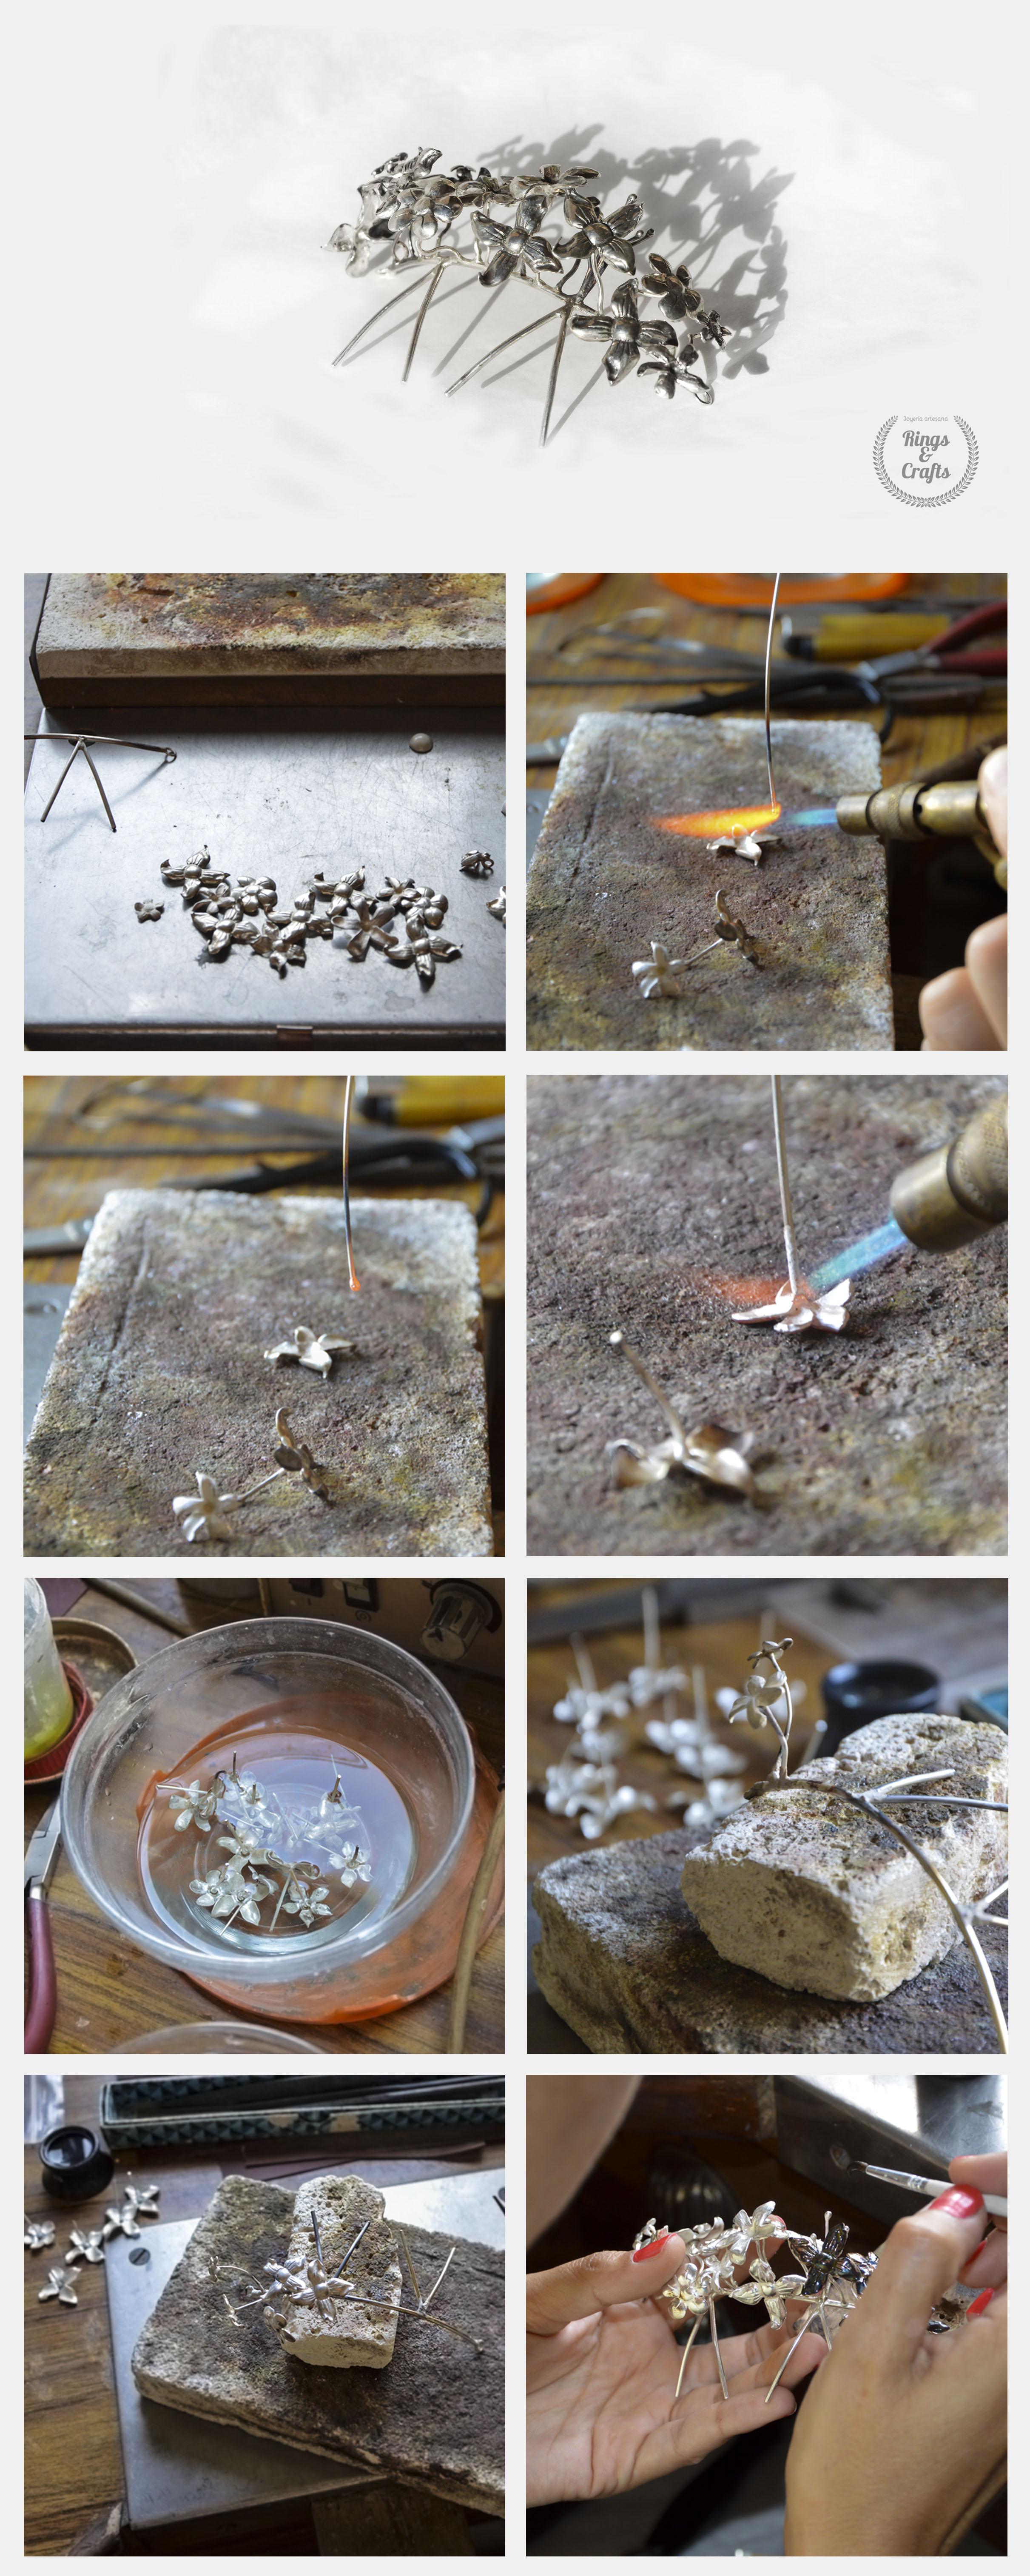 Tocado de flores de plata hecho a mano.